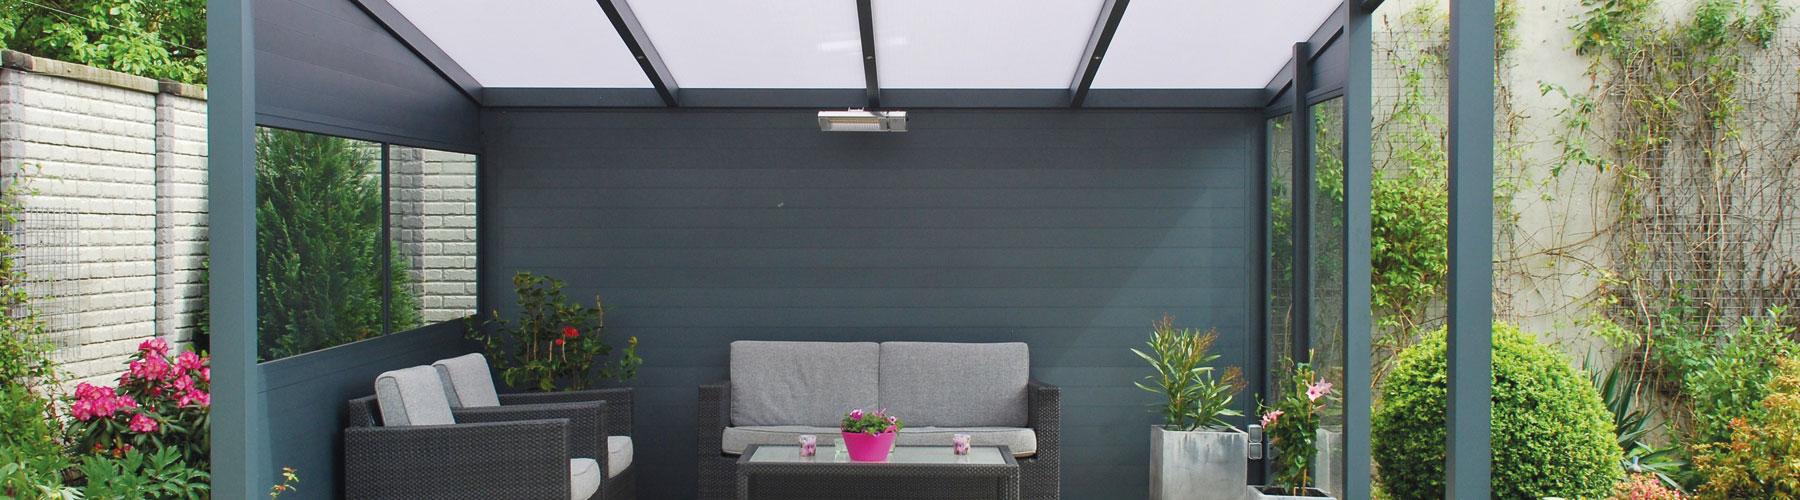 Verasol Lounge Set 2.1800x500x1